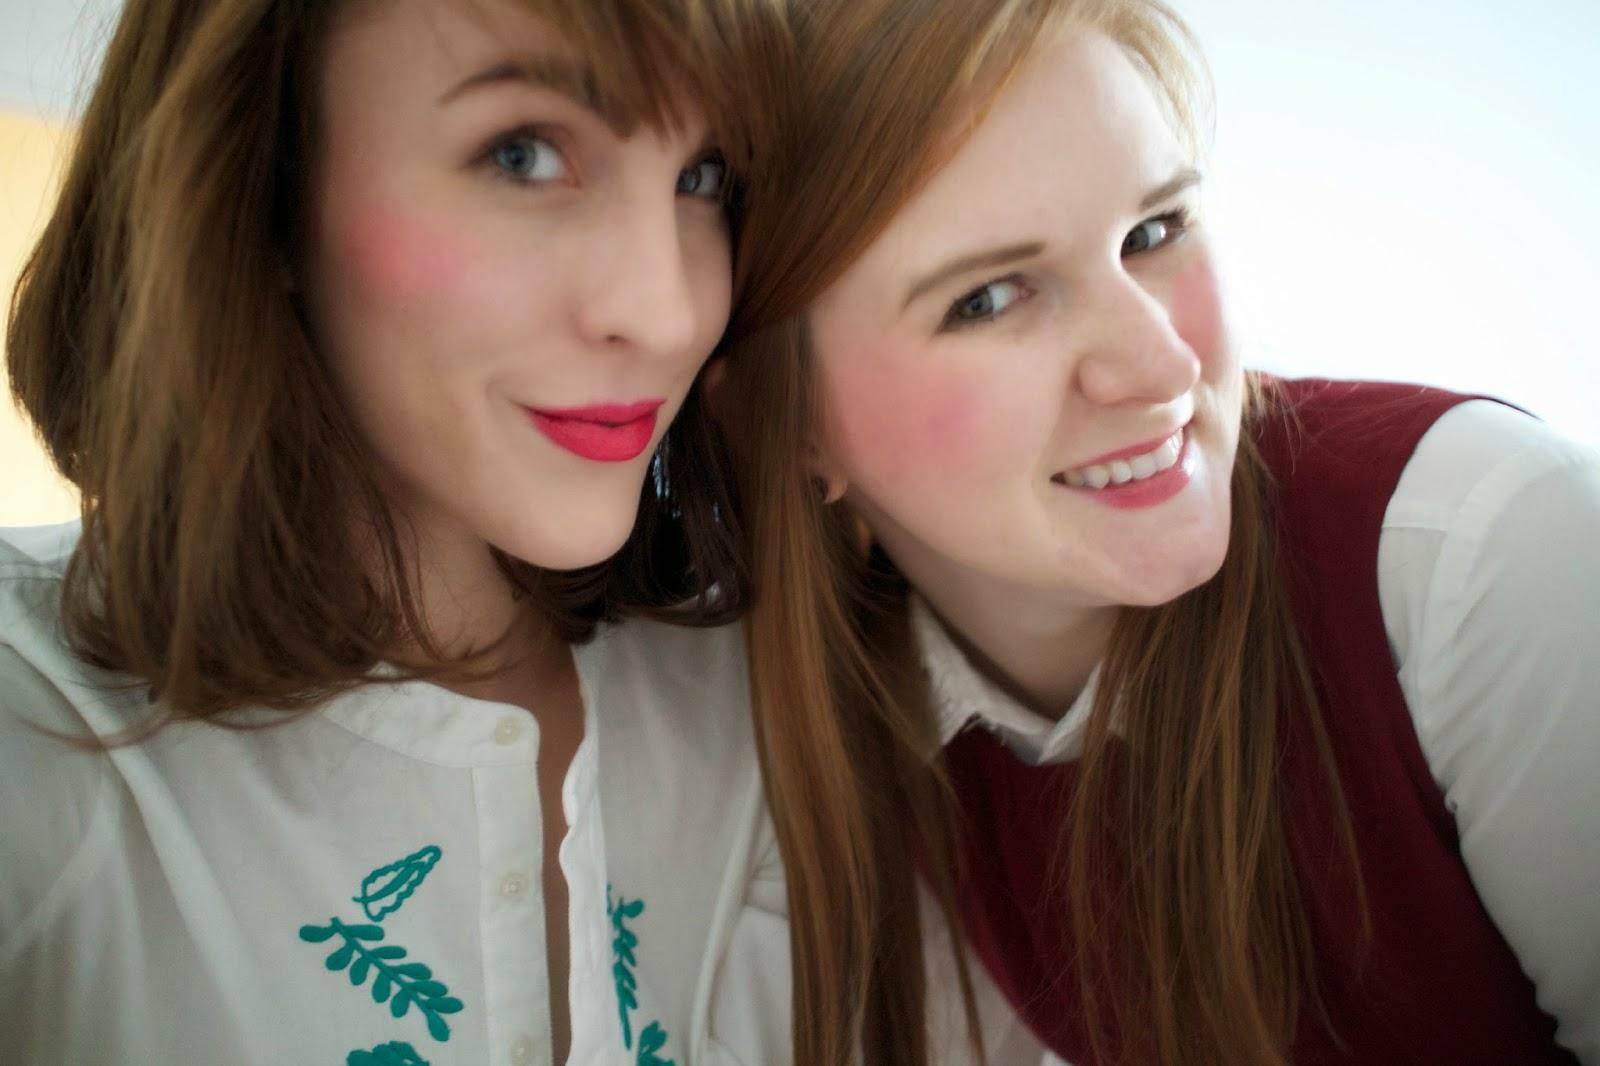 pretty posh oh my gosh blogging duo best friends